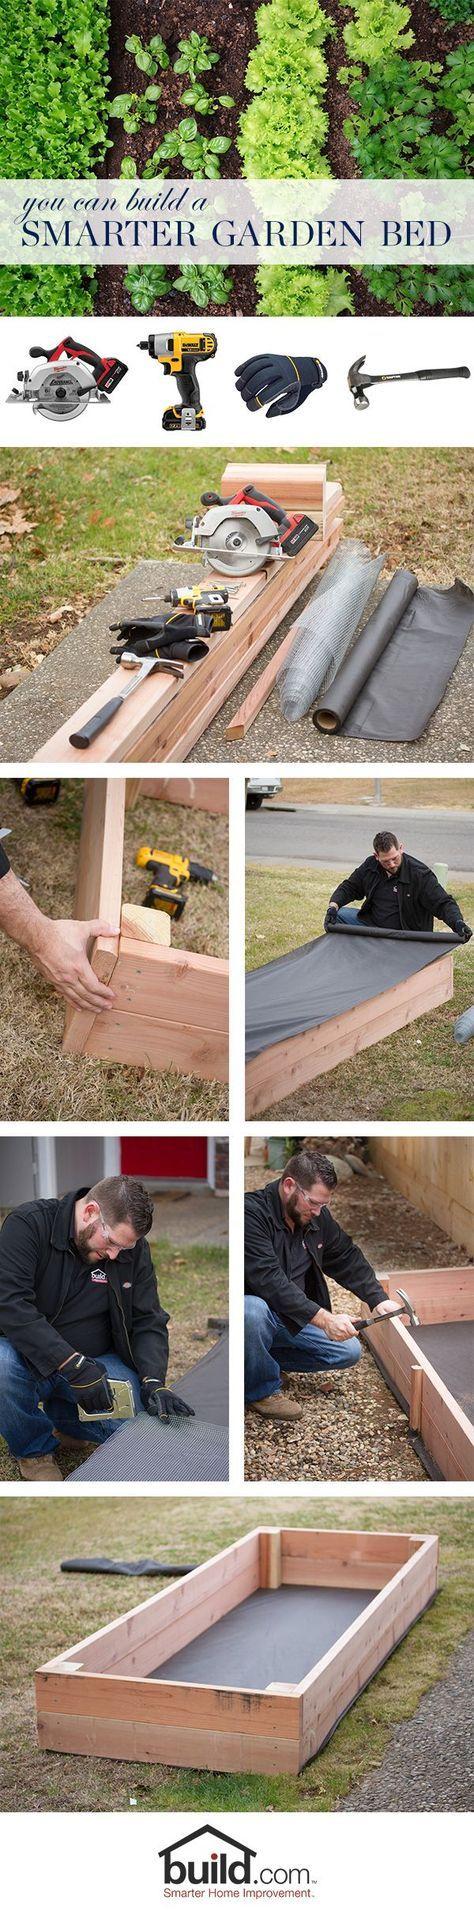 Learn how to build a smarter raised garden bed (no weeds, no pests) for your spring garden. #smarterhomeimprovement